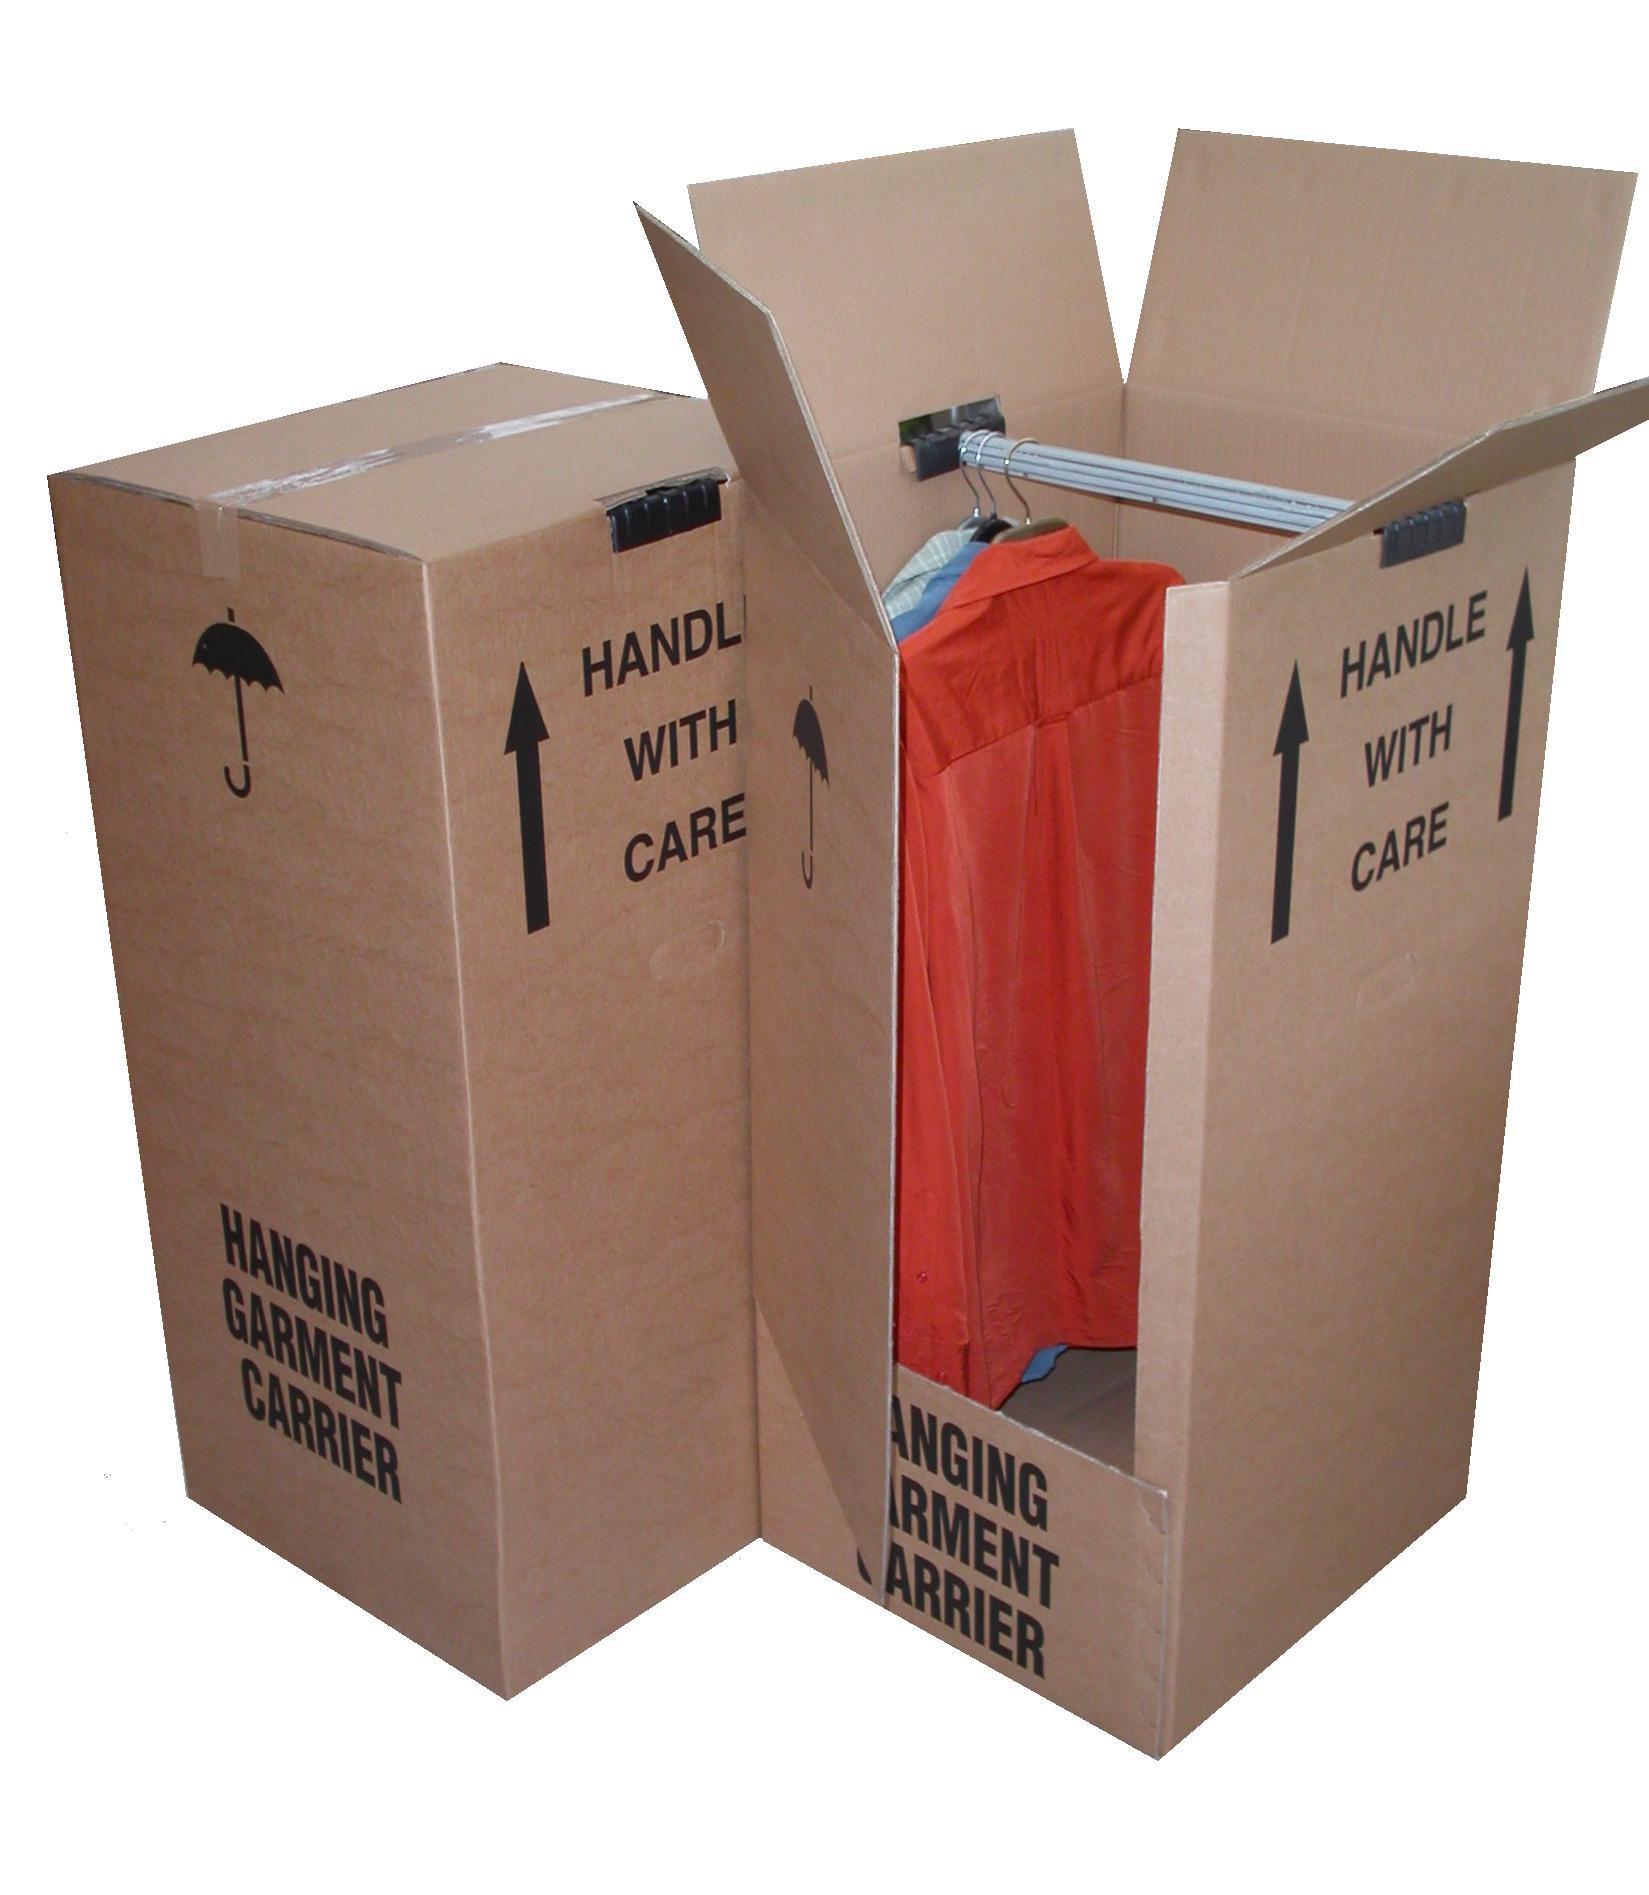 Hanging-garment carrier